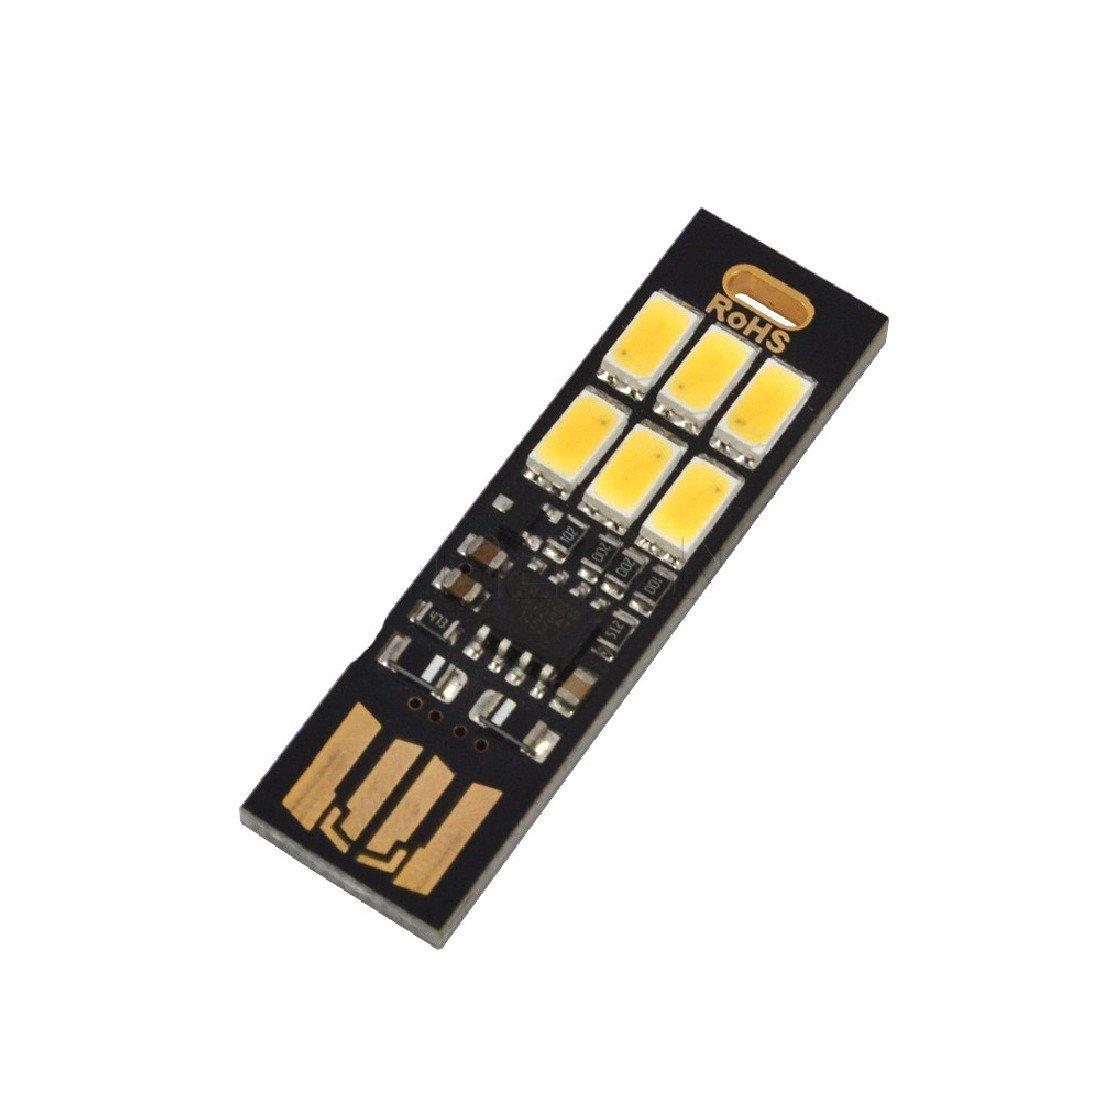 Fashion Mini 5v Usb Power Led Light Touch Dimmer Adjust Night 3way Sensor Switch Control 110 220v Lamp Desk Bulb Card Warm White Kitchen Home